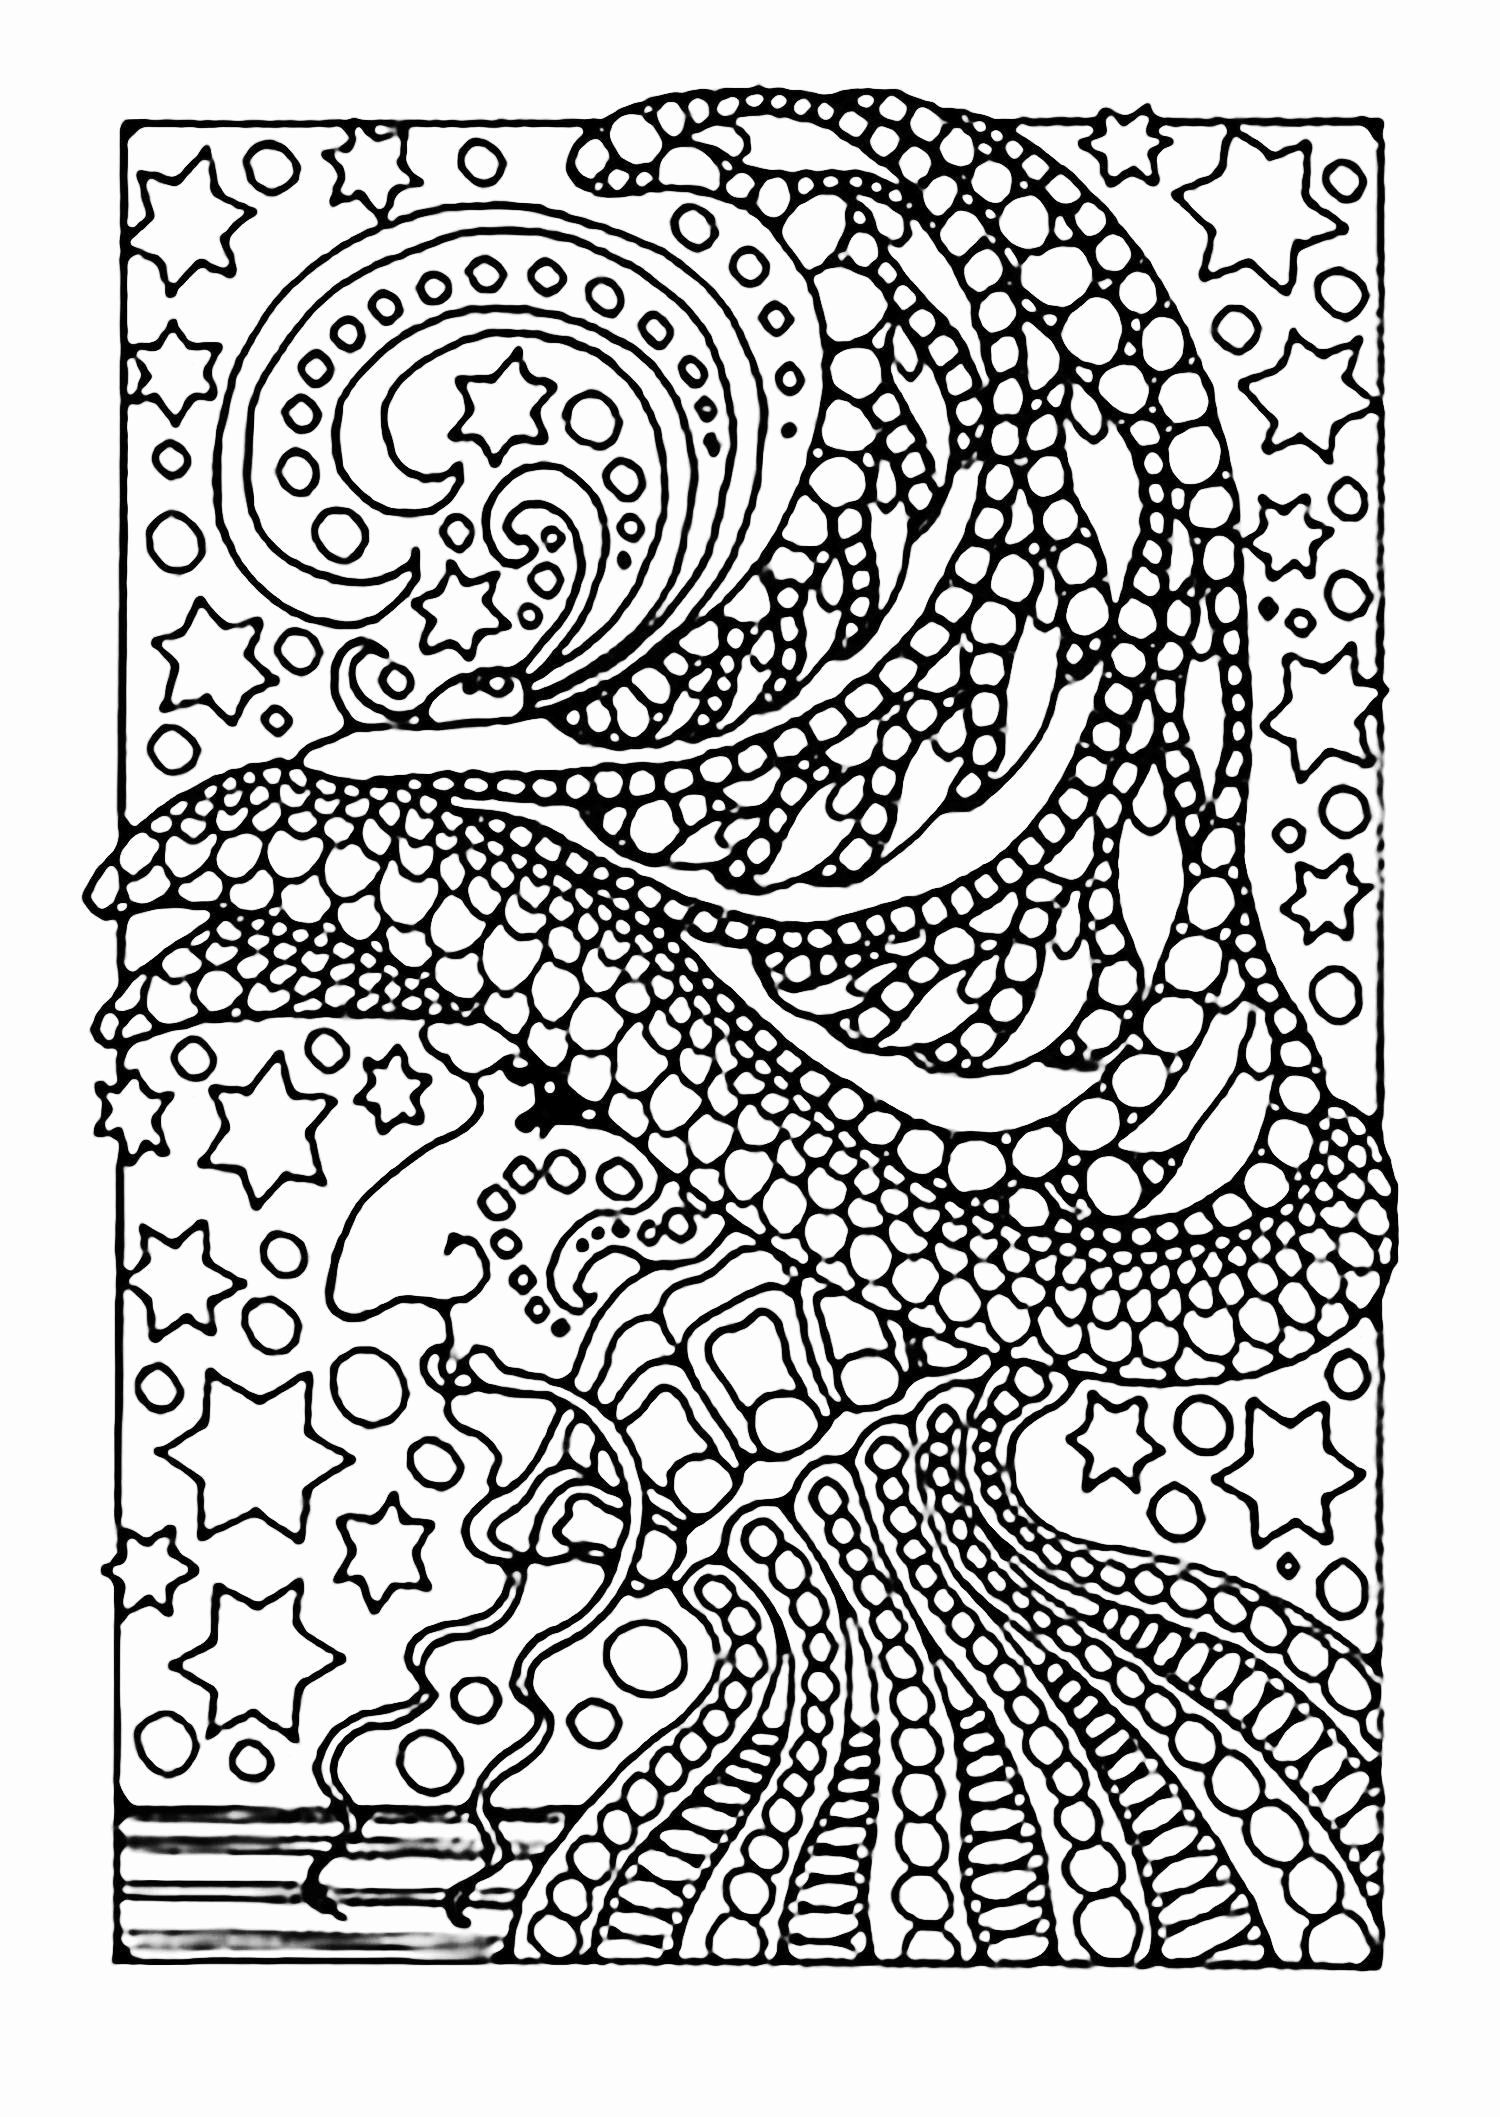 Holiday Coloring Books For Adults Inspirational 27 Jewish Holiday Coloring Pages Download Coloring Sheets Buku Mewarnai Halaman Mewarnai Halaman Mewarnai Bunga